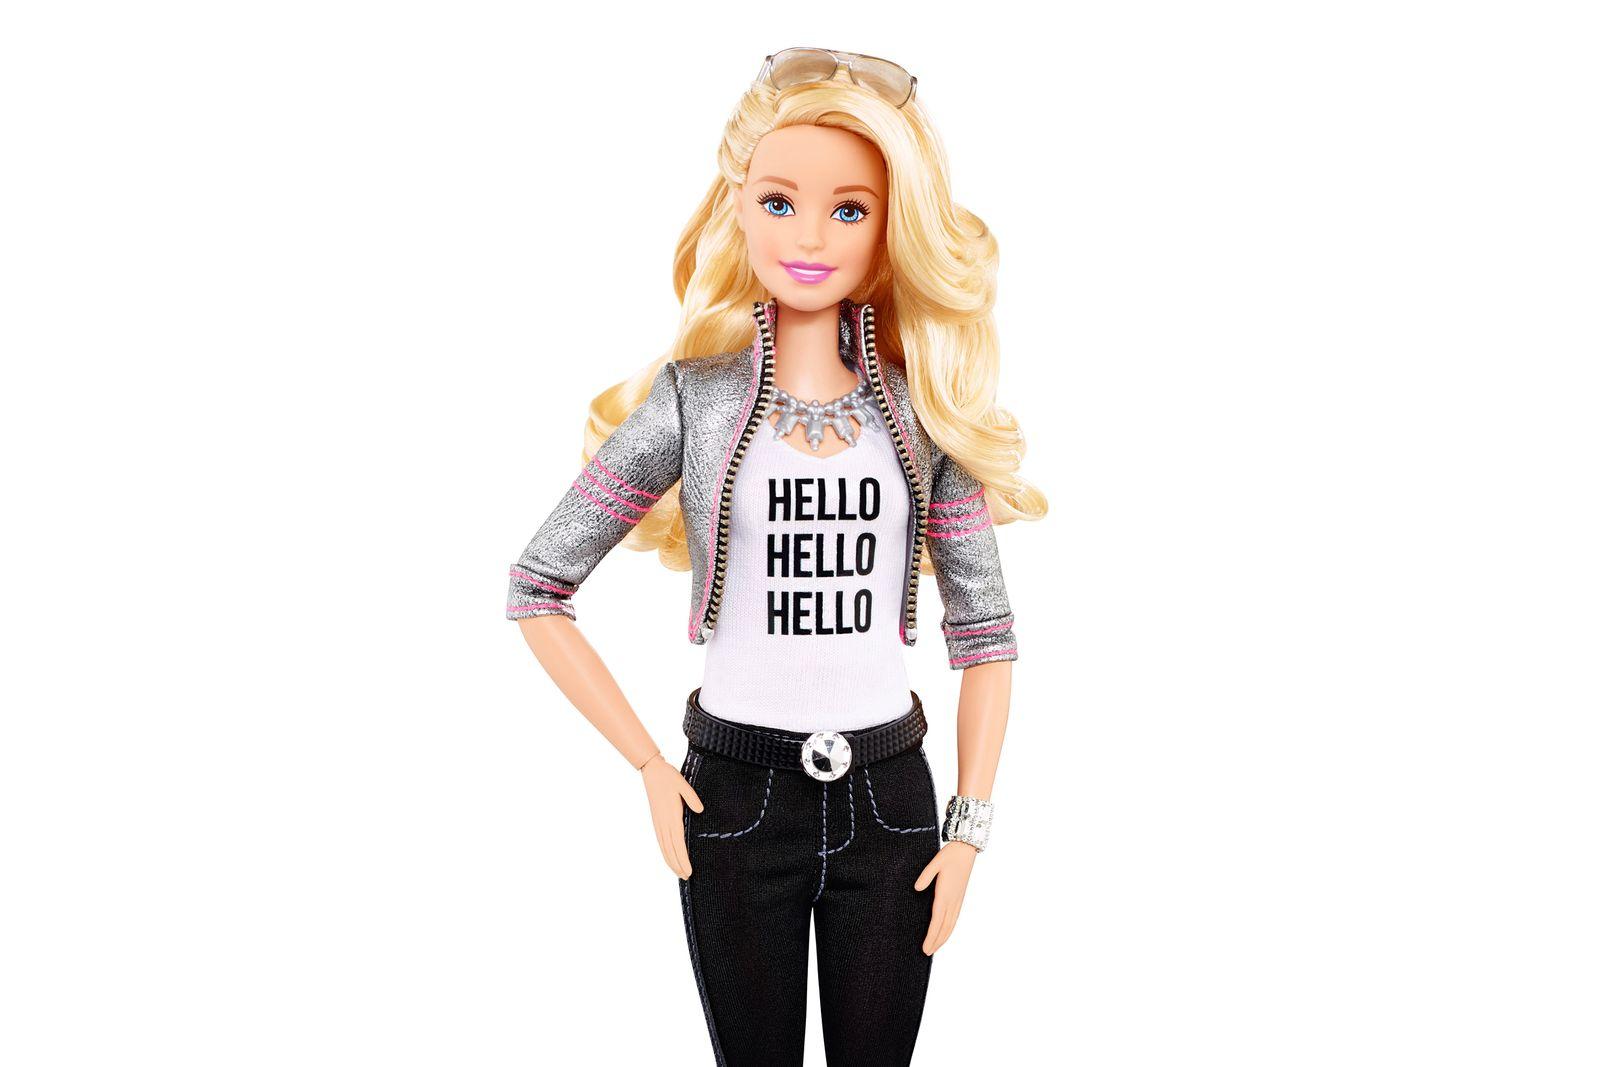 Margot Robbie/ Barbie